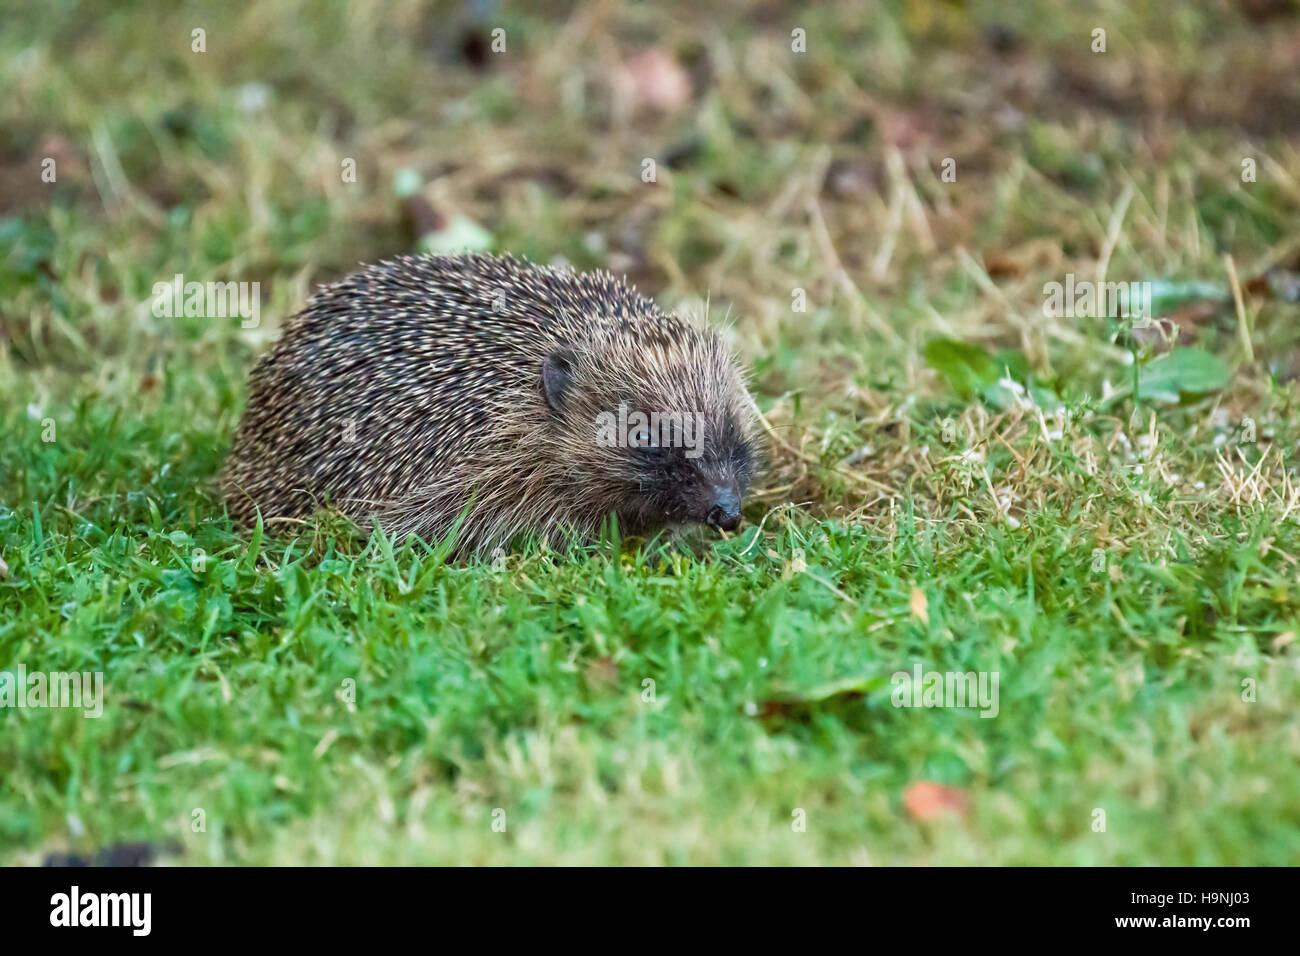 European Hedgehog in garden. Stock Photo